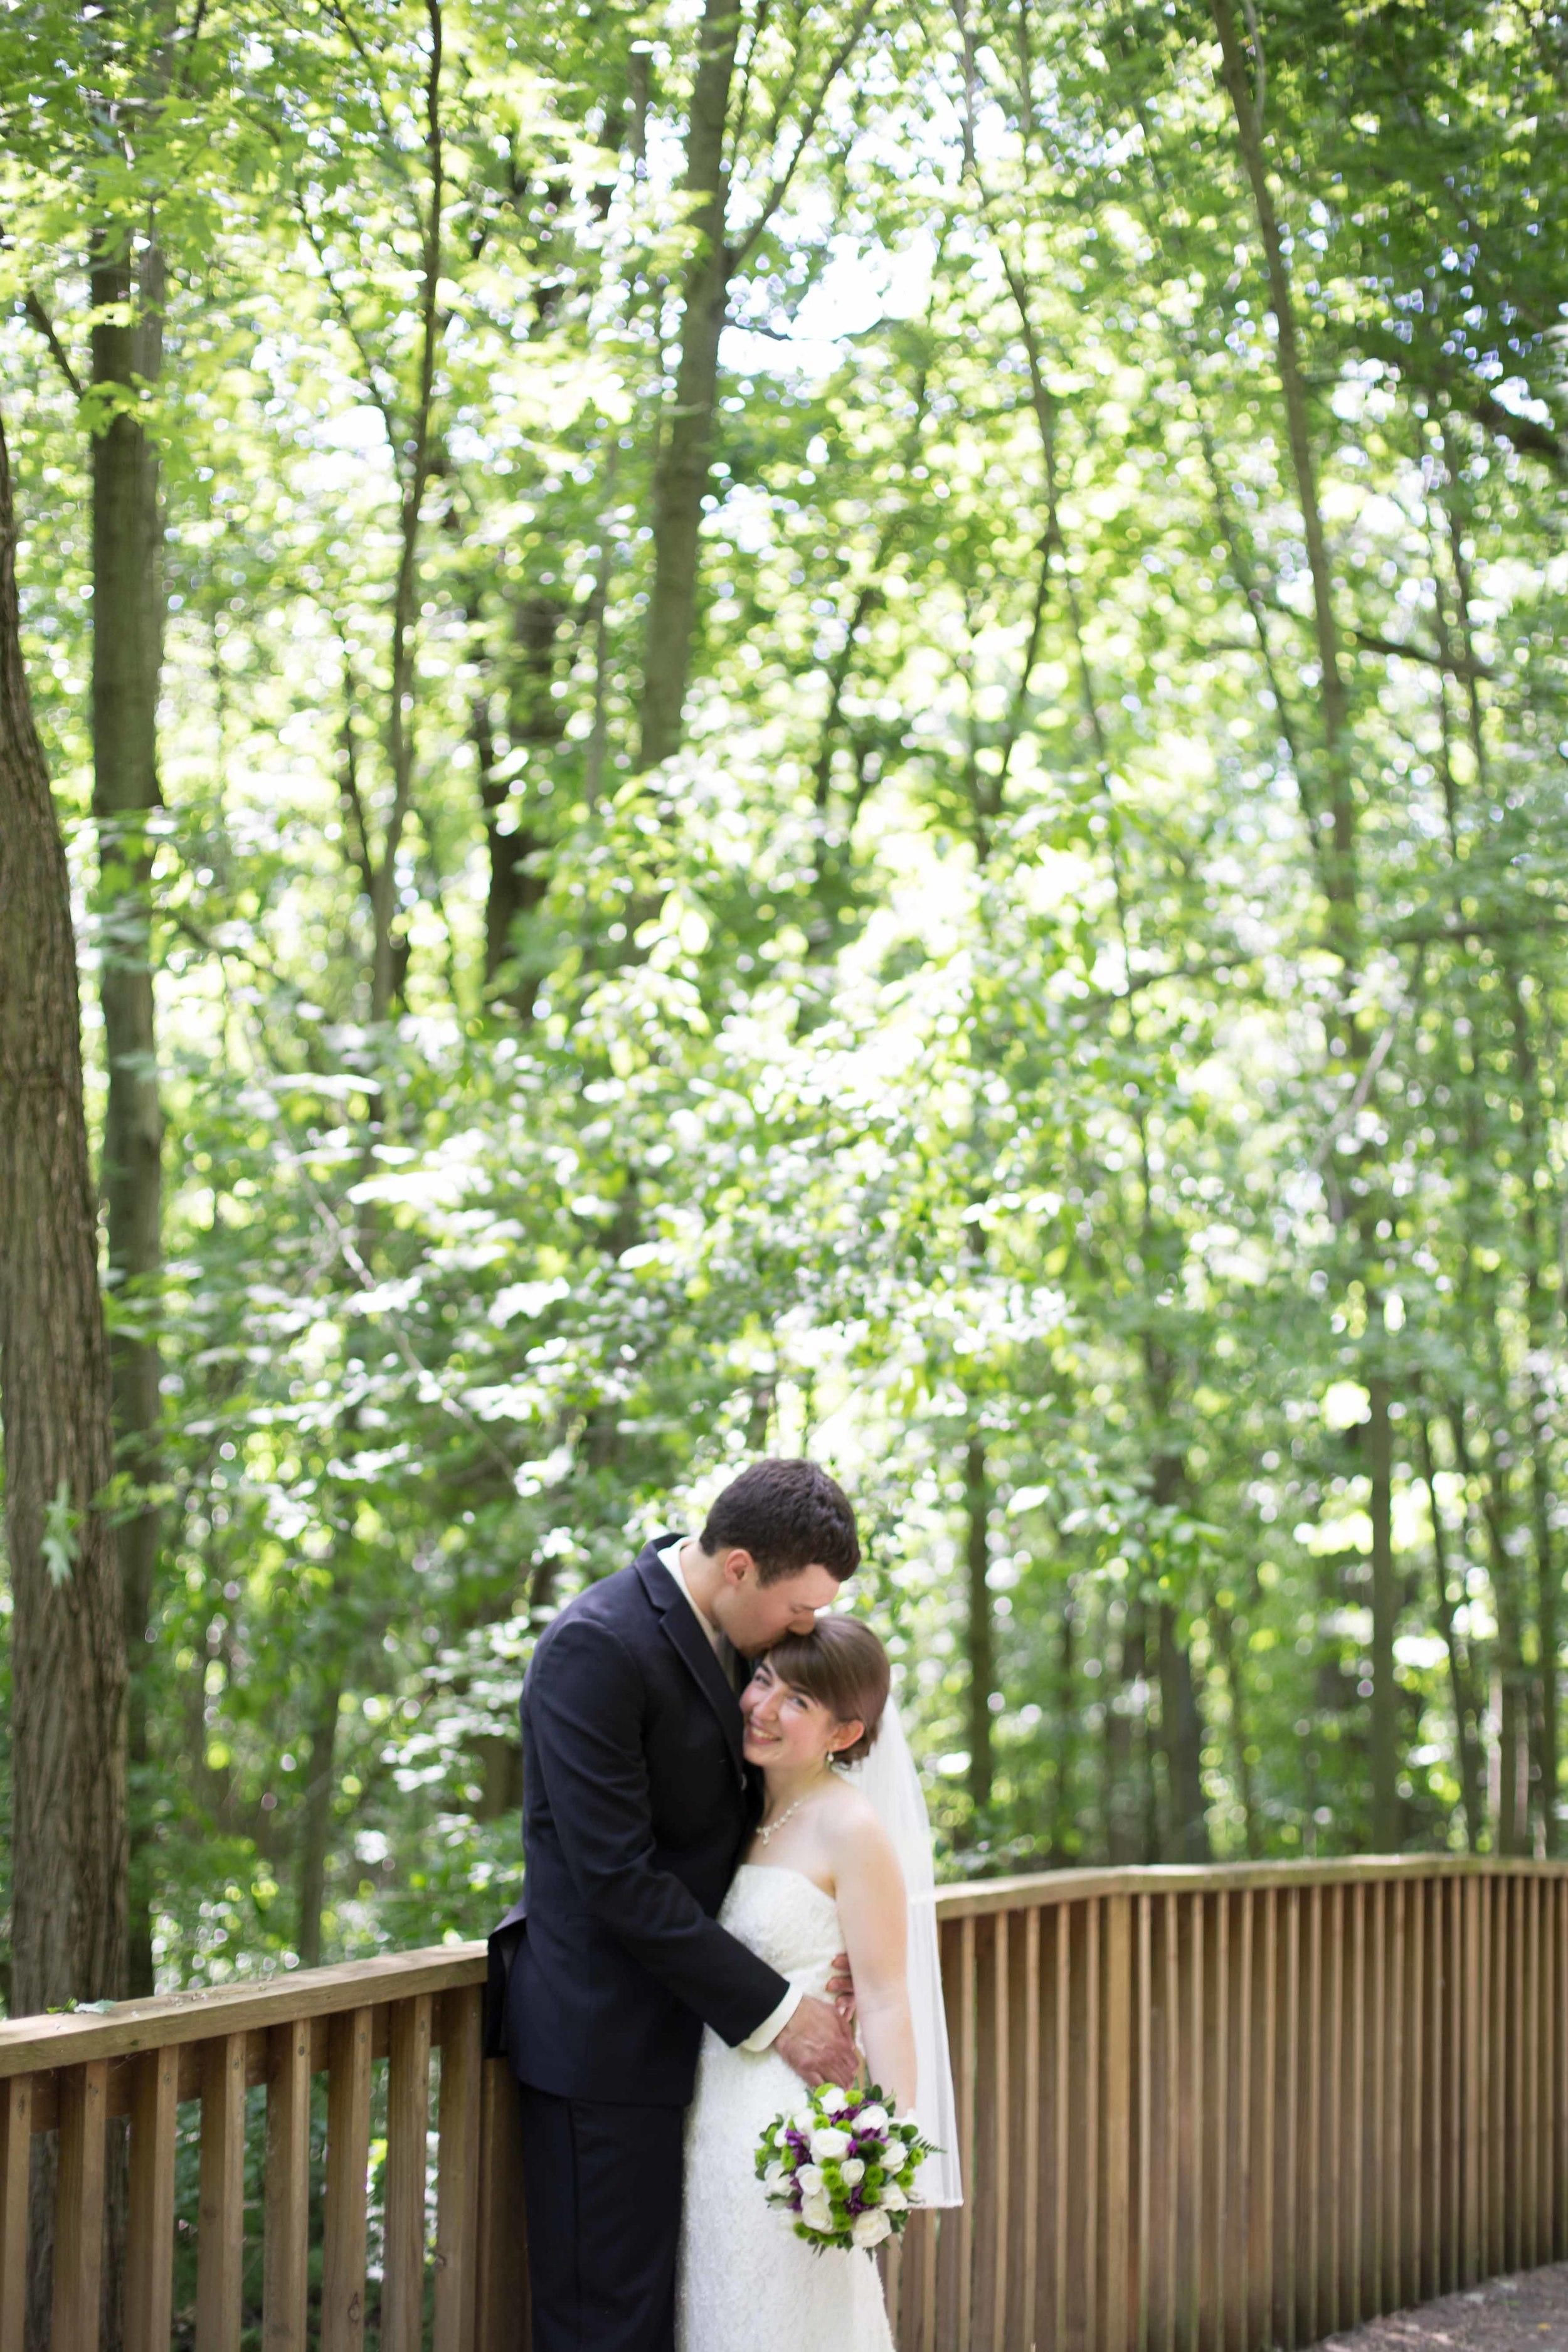 Fox Valley Wedding Photographer - Whit Meza Photography